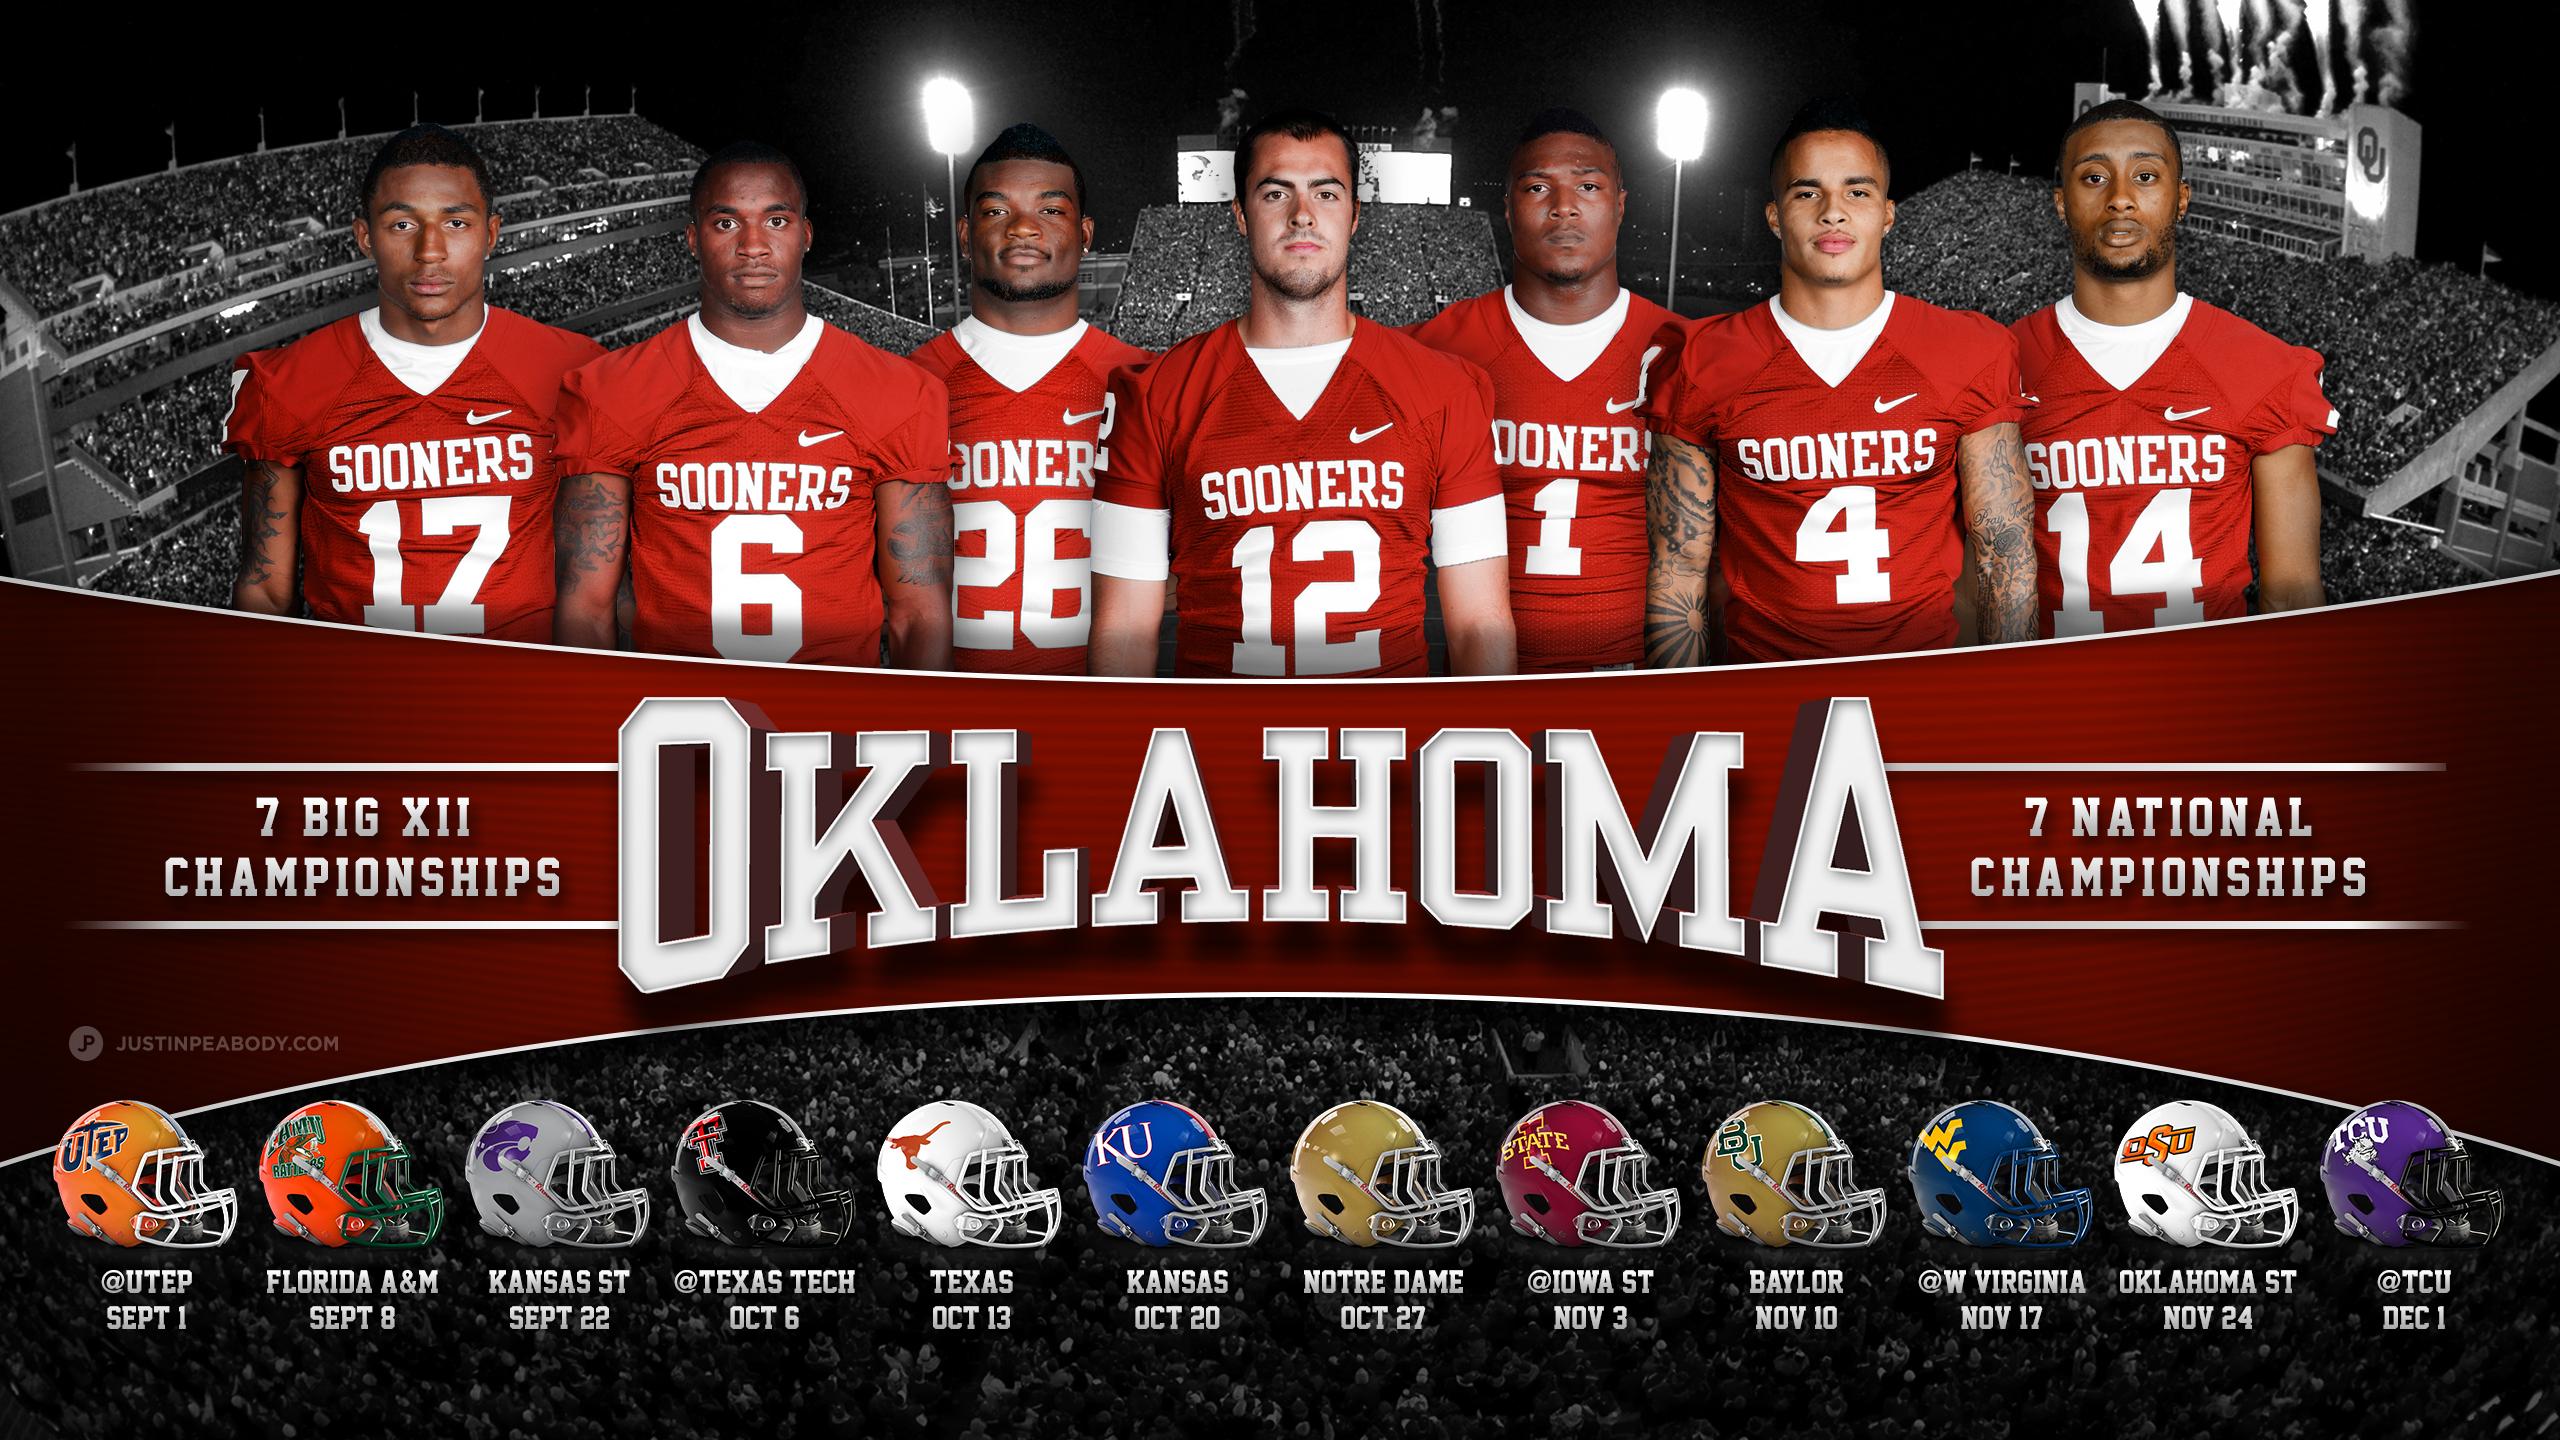 Oklahoma Sooners Wallpaper For Iphone Ou Football Wallpaper